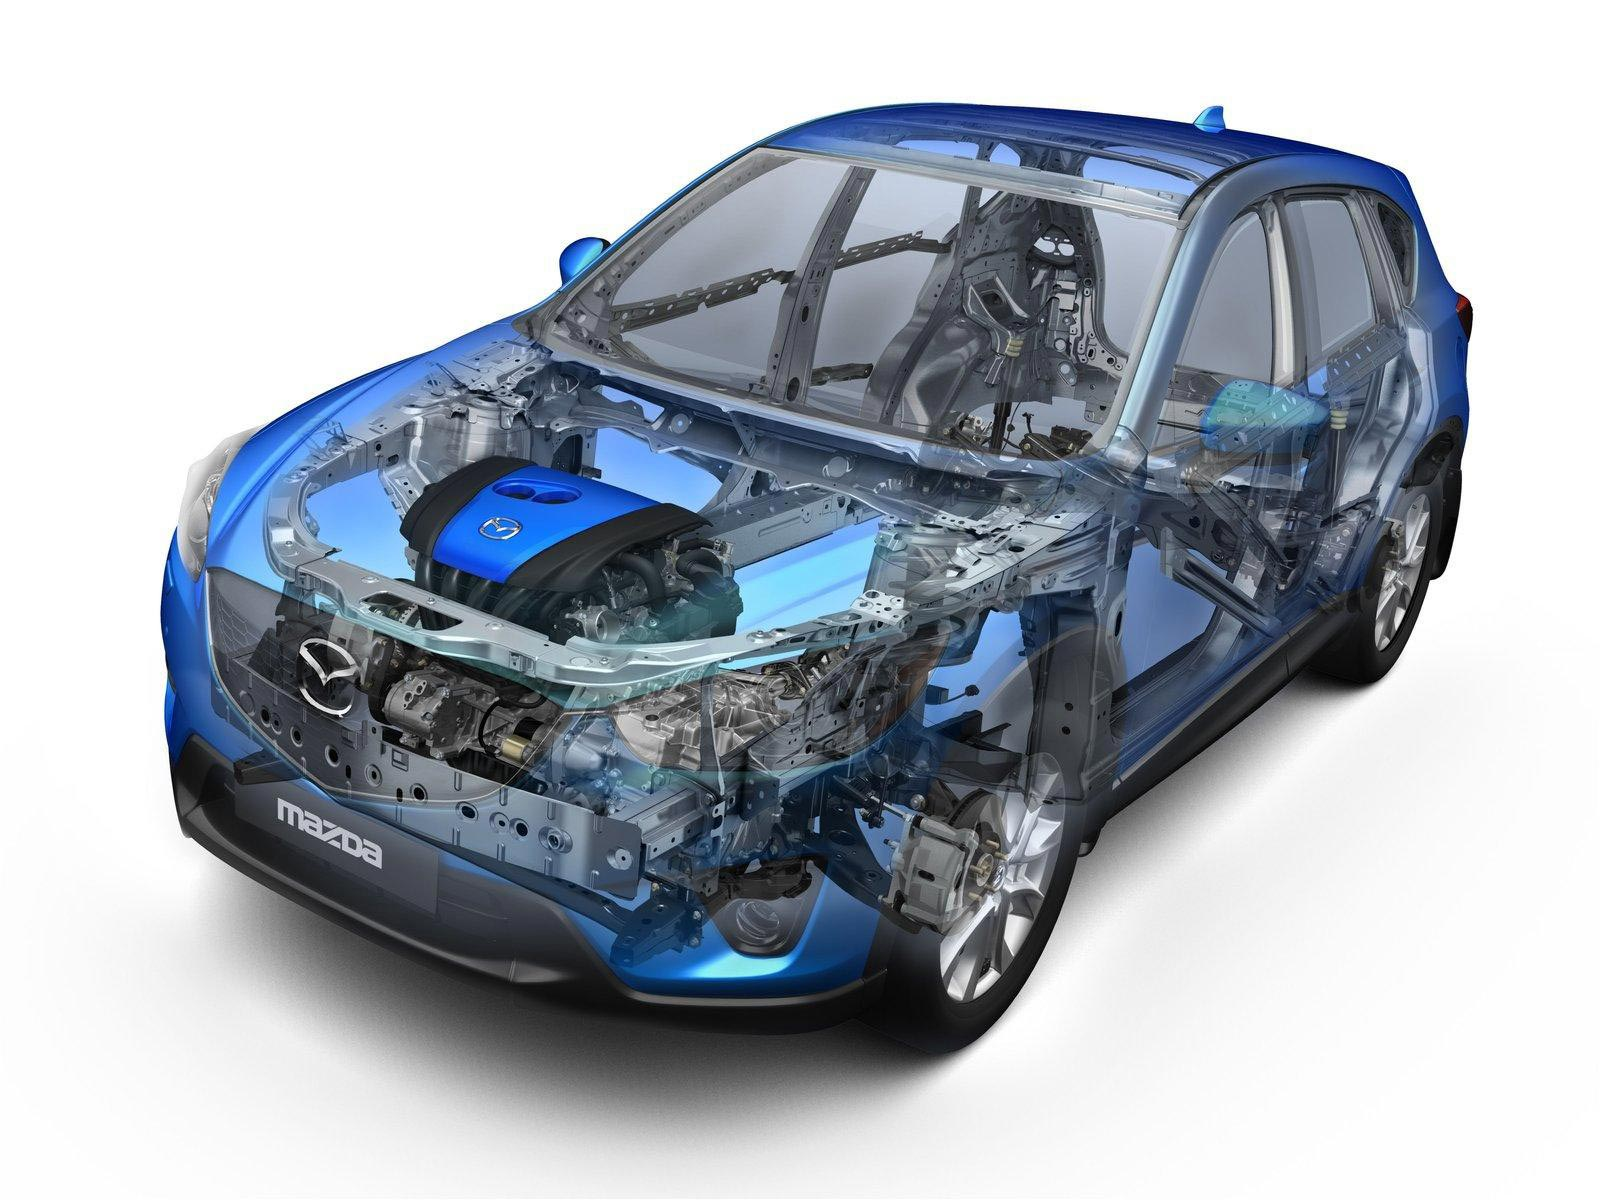 Mazda CX-5 cutaway